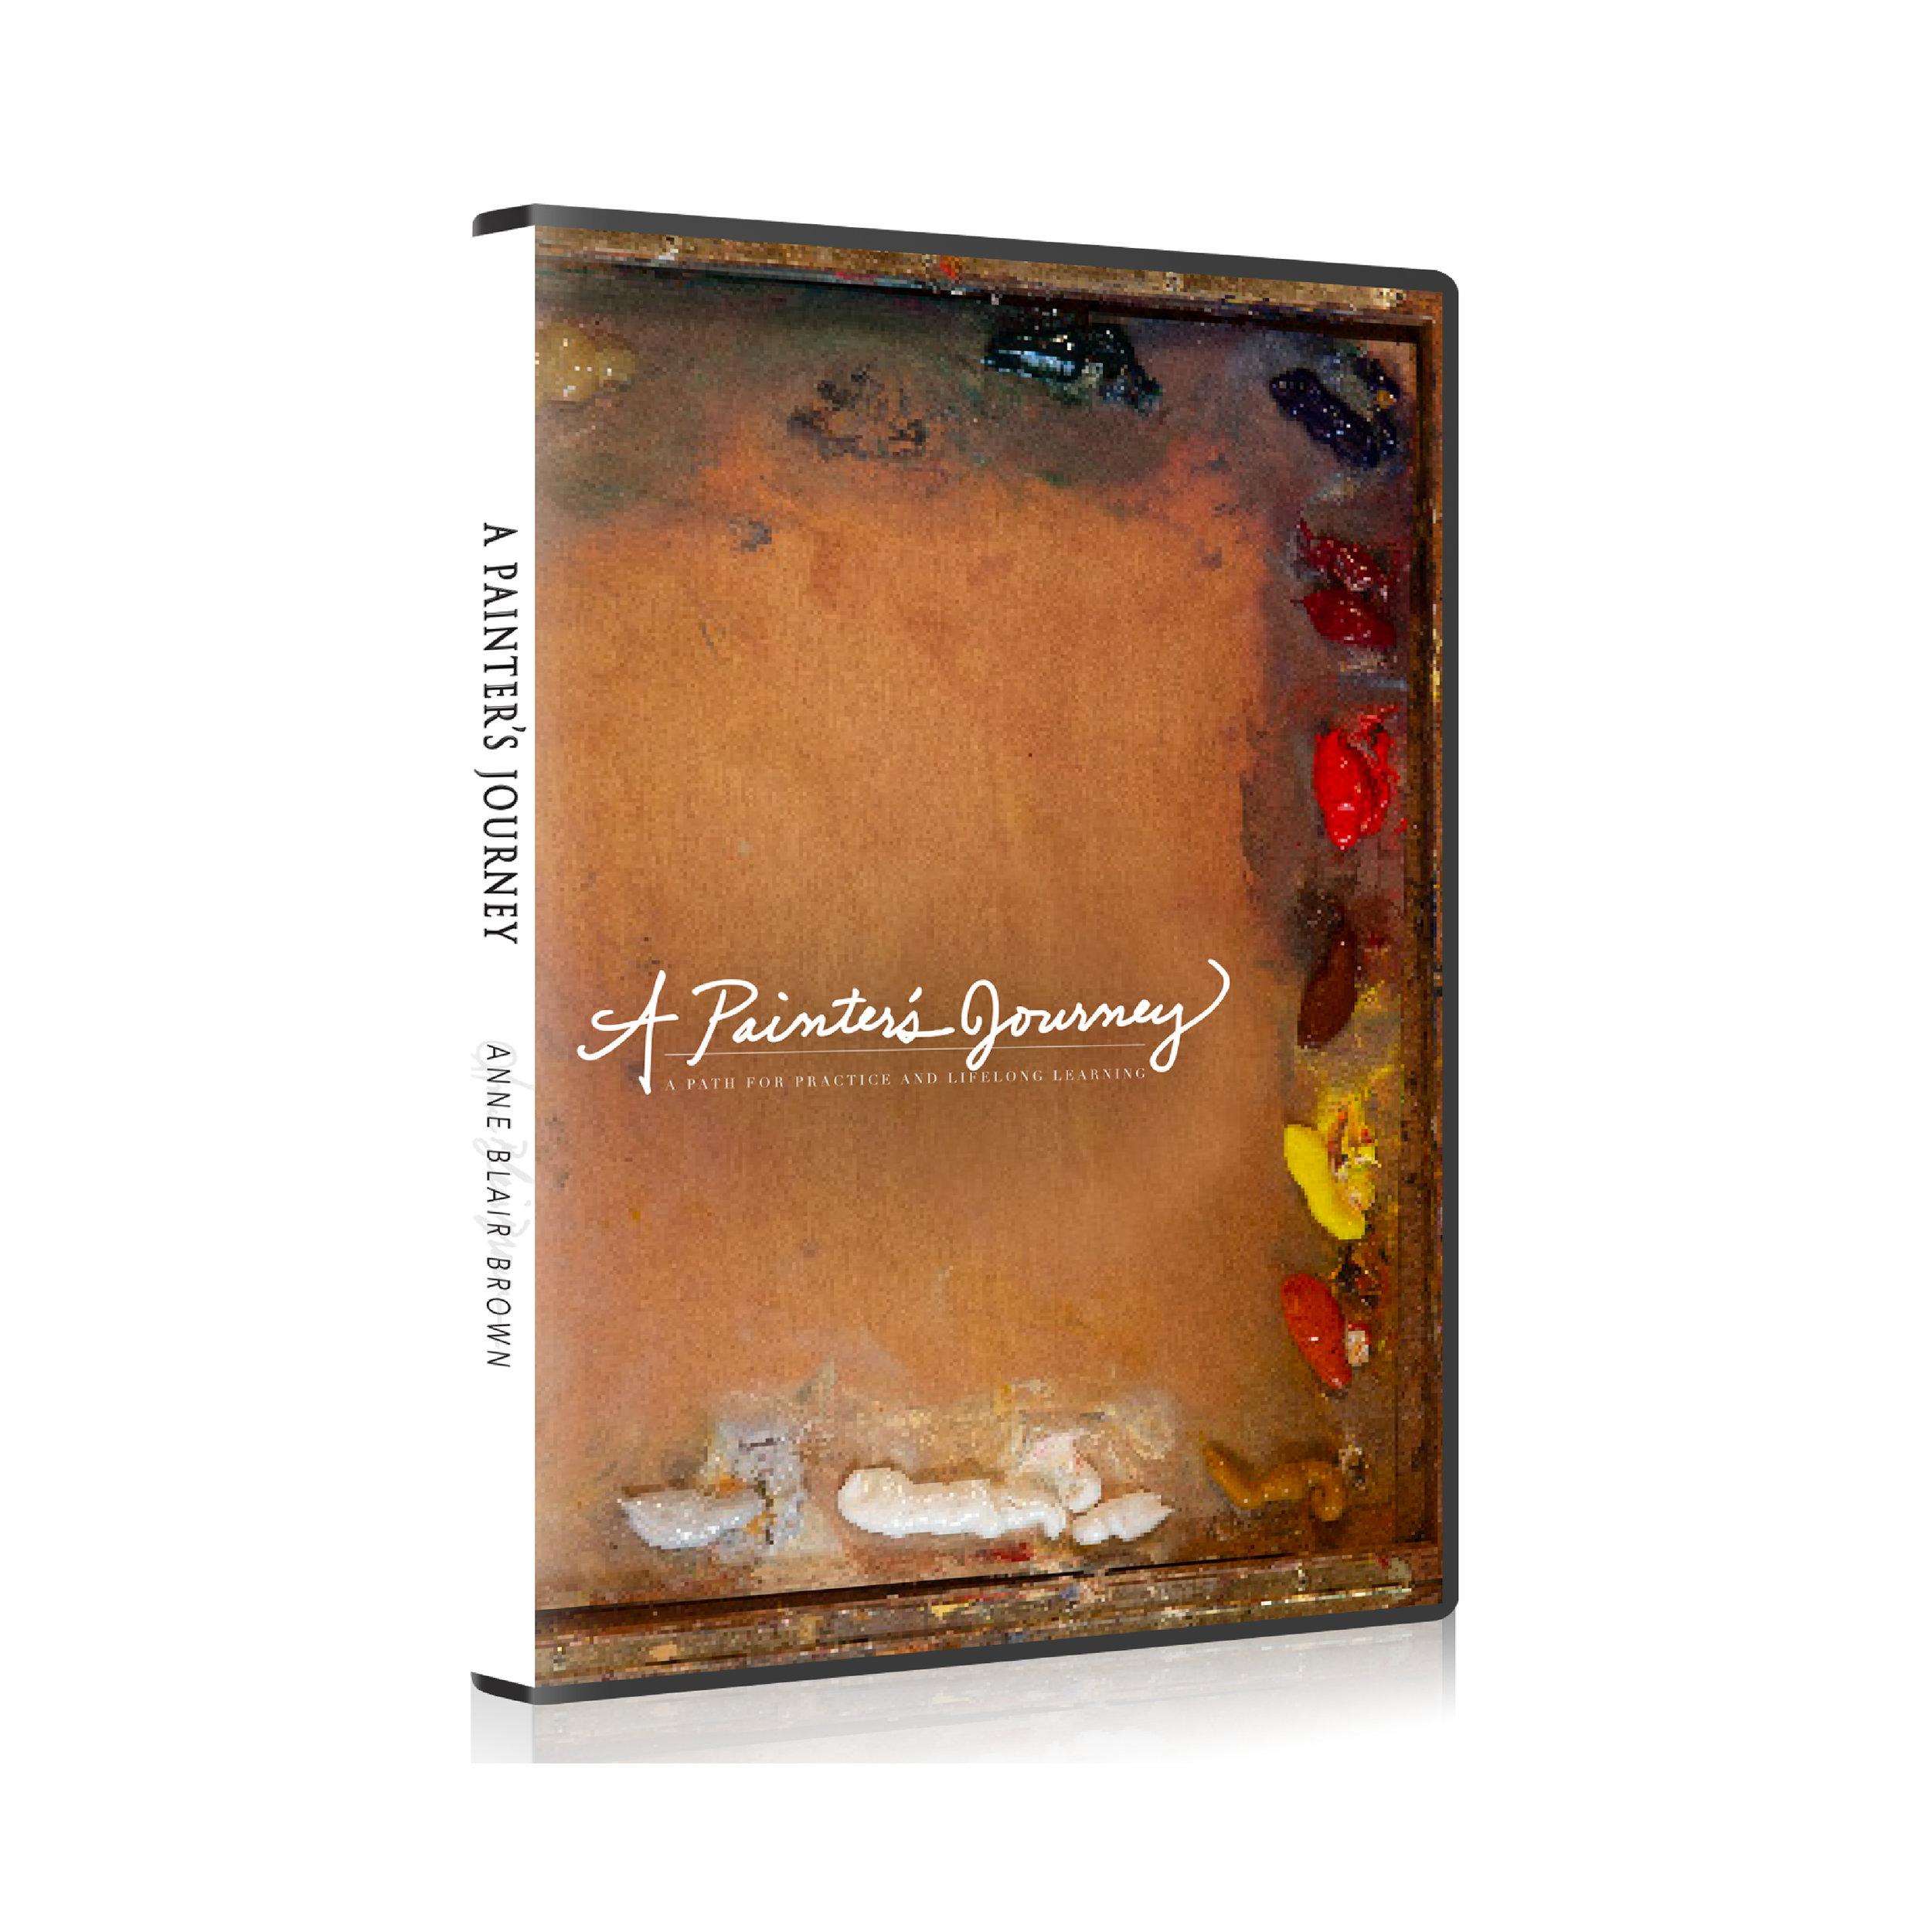 Free CD DVD Disc Cover Mock-up PSD.jpg